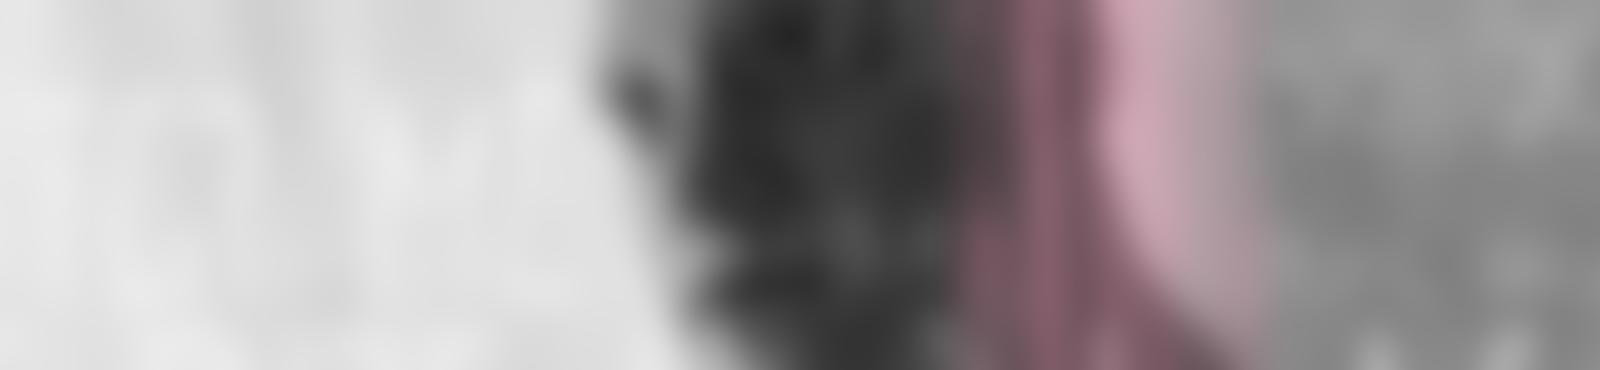 Blurred 6af1adc7 2f11 44d0 8447 ec9ee3ebf7de